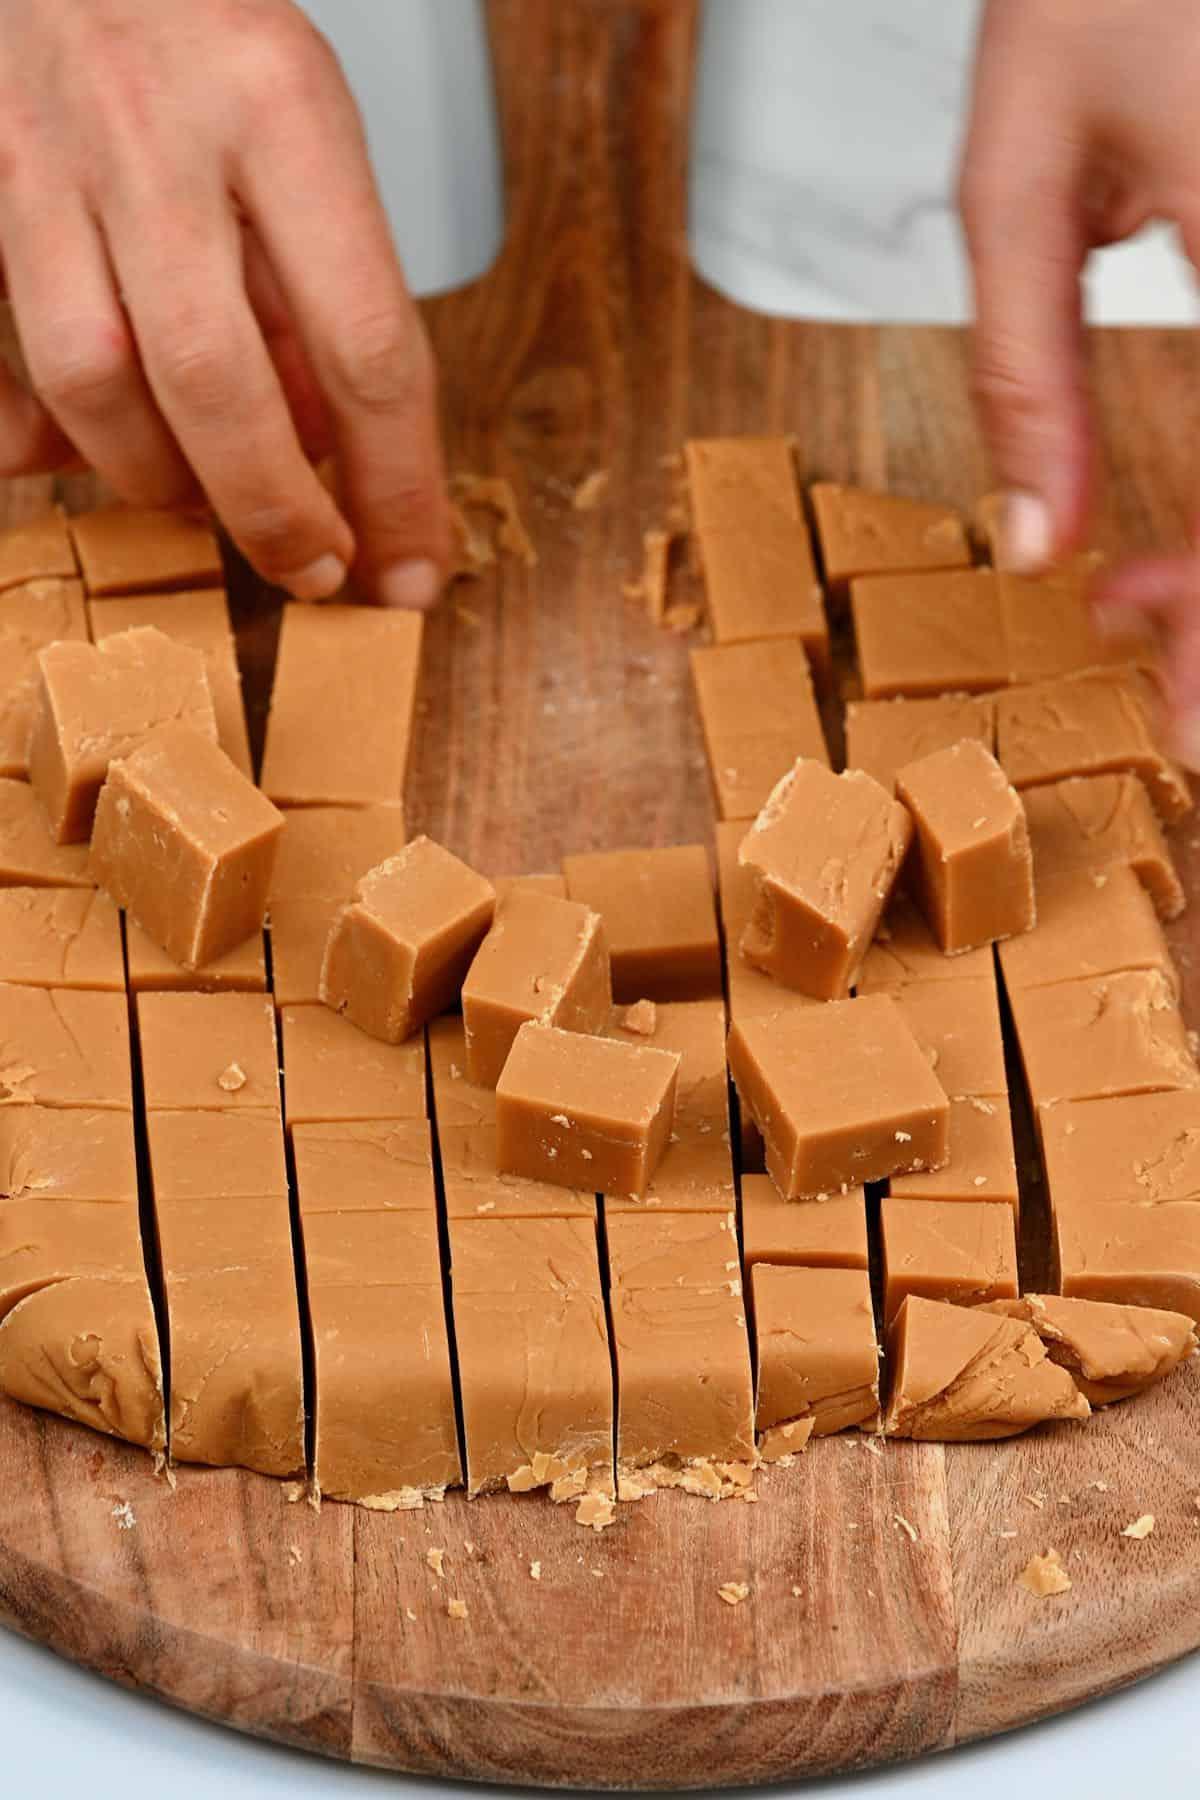 Cubes cut from homemade fudge